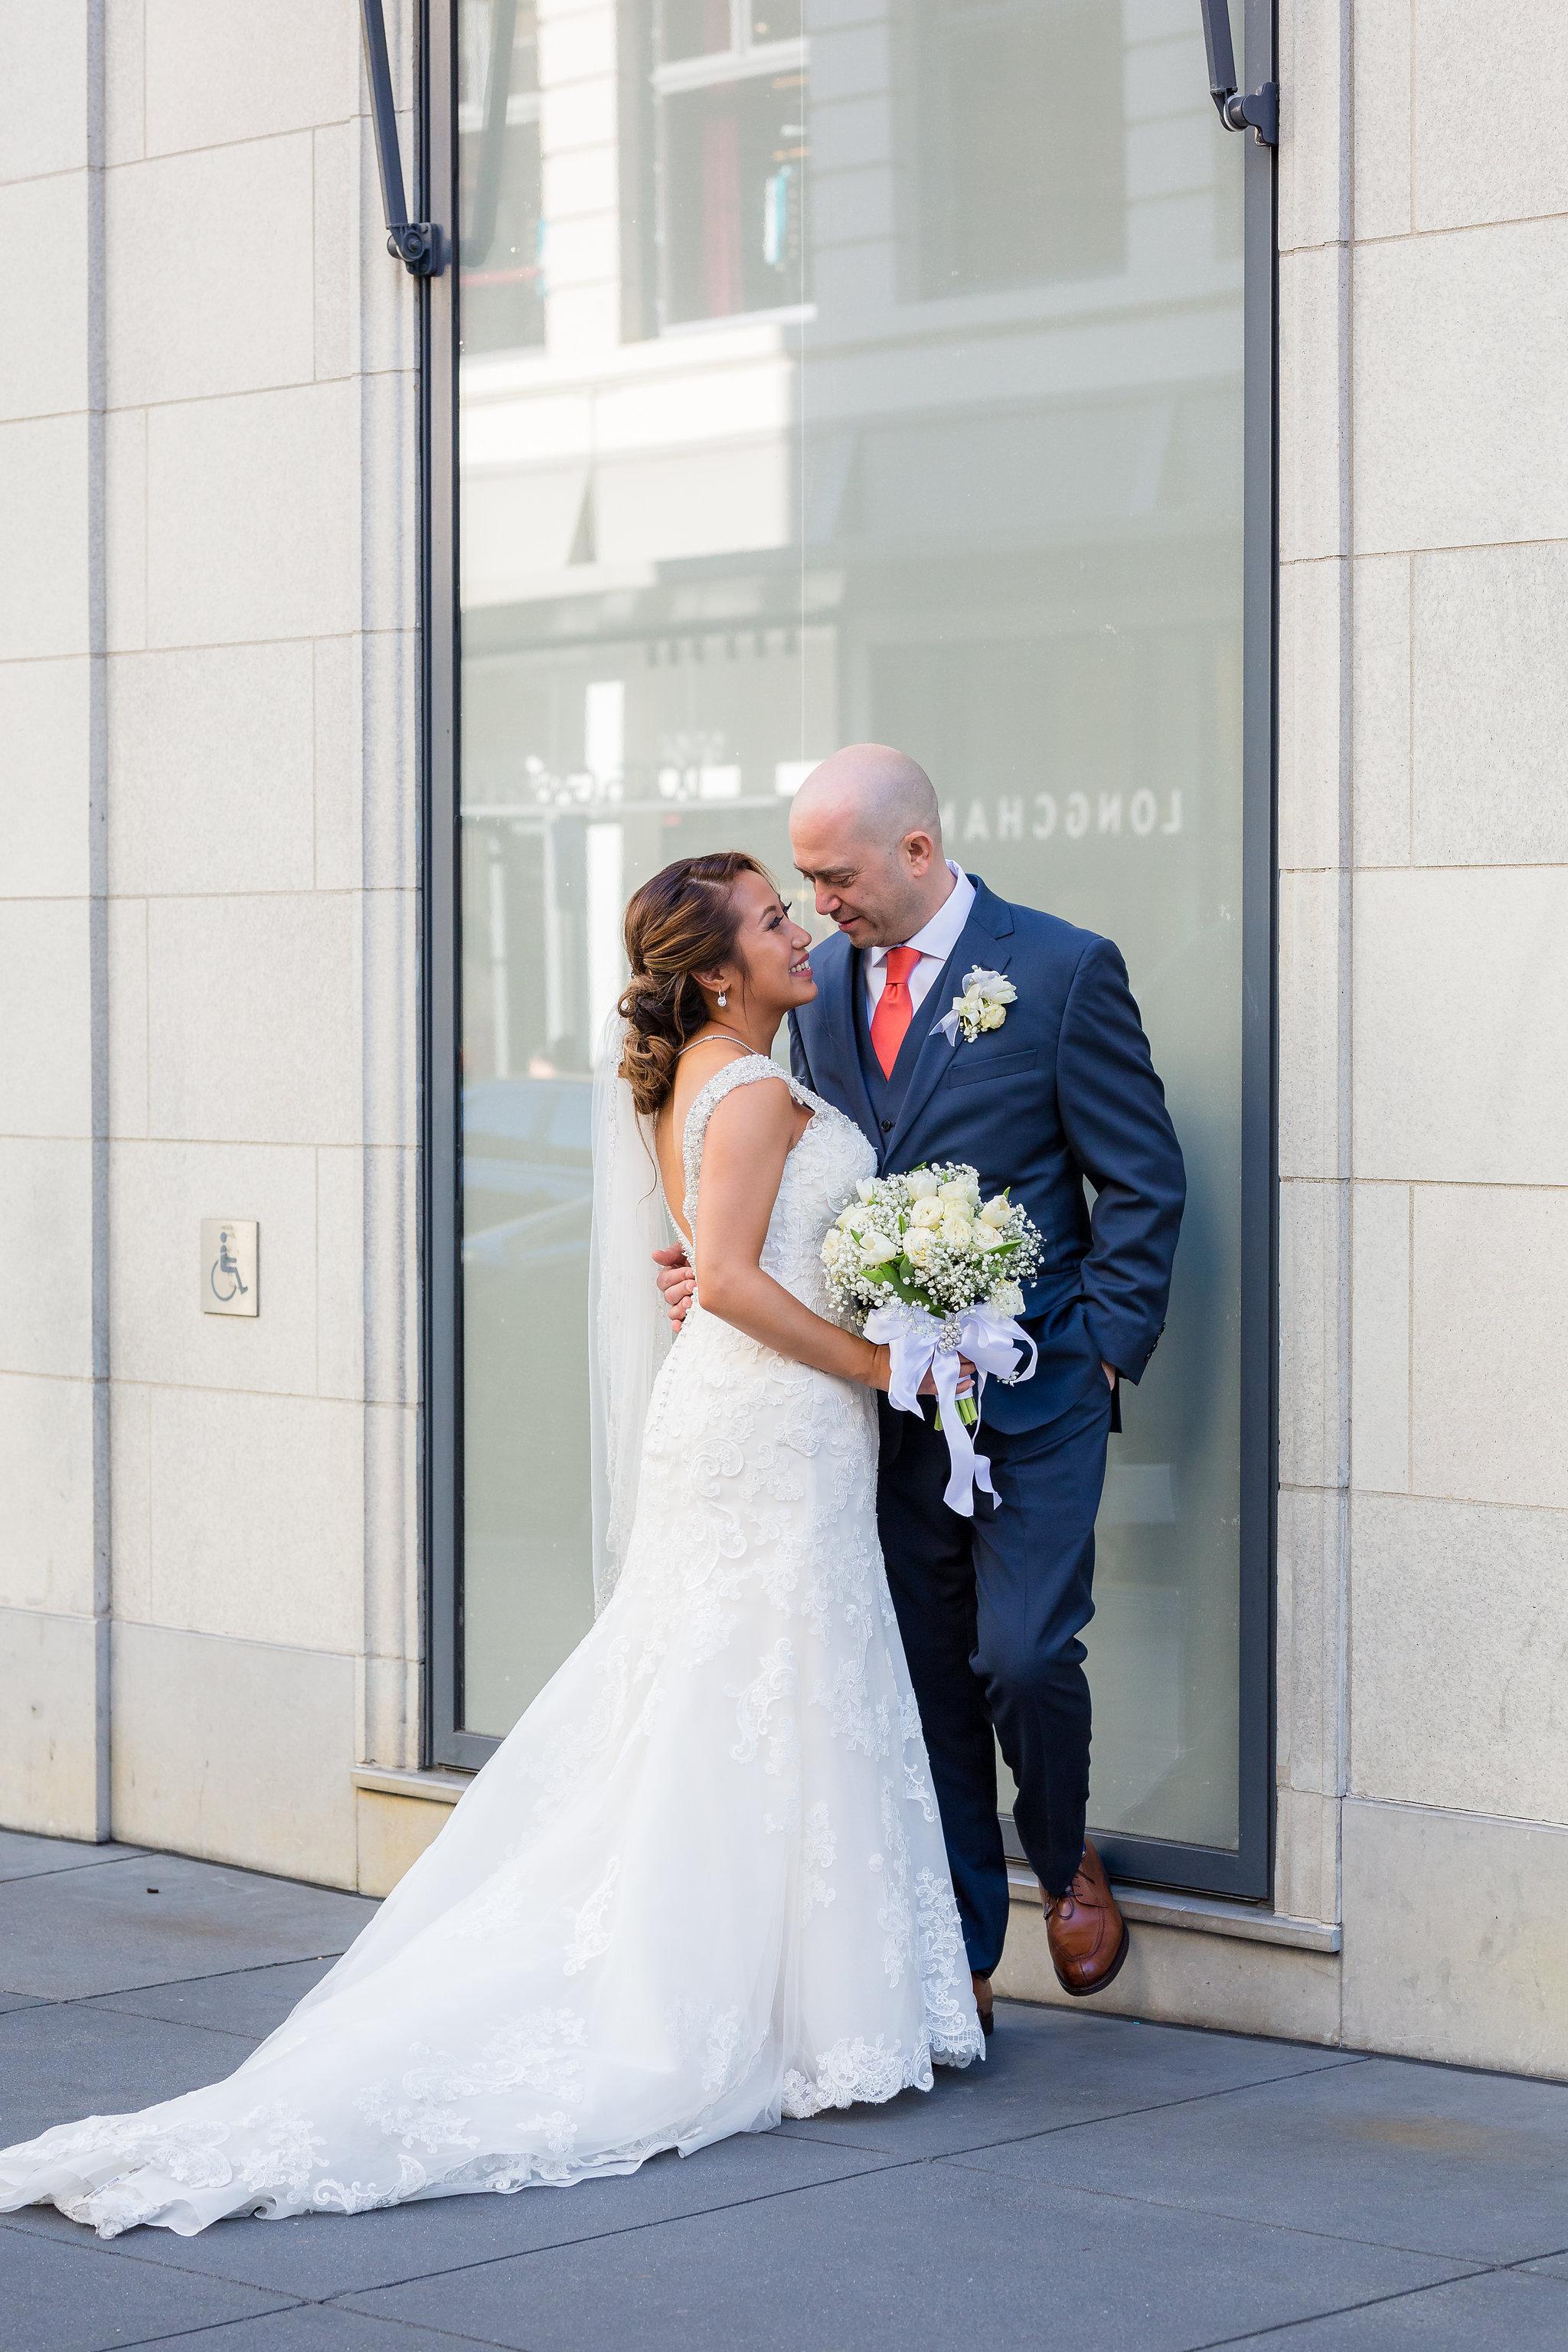 union square wedding photography-14.jpg